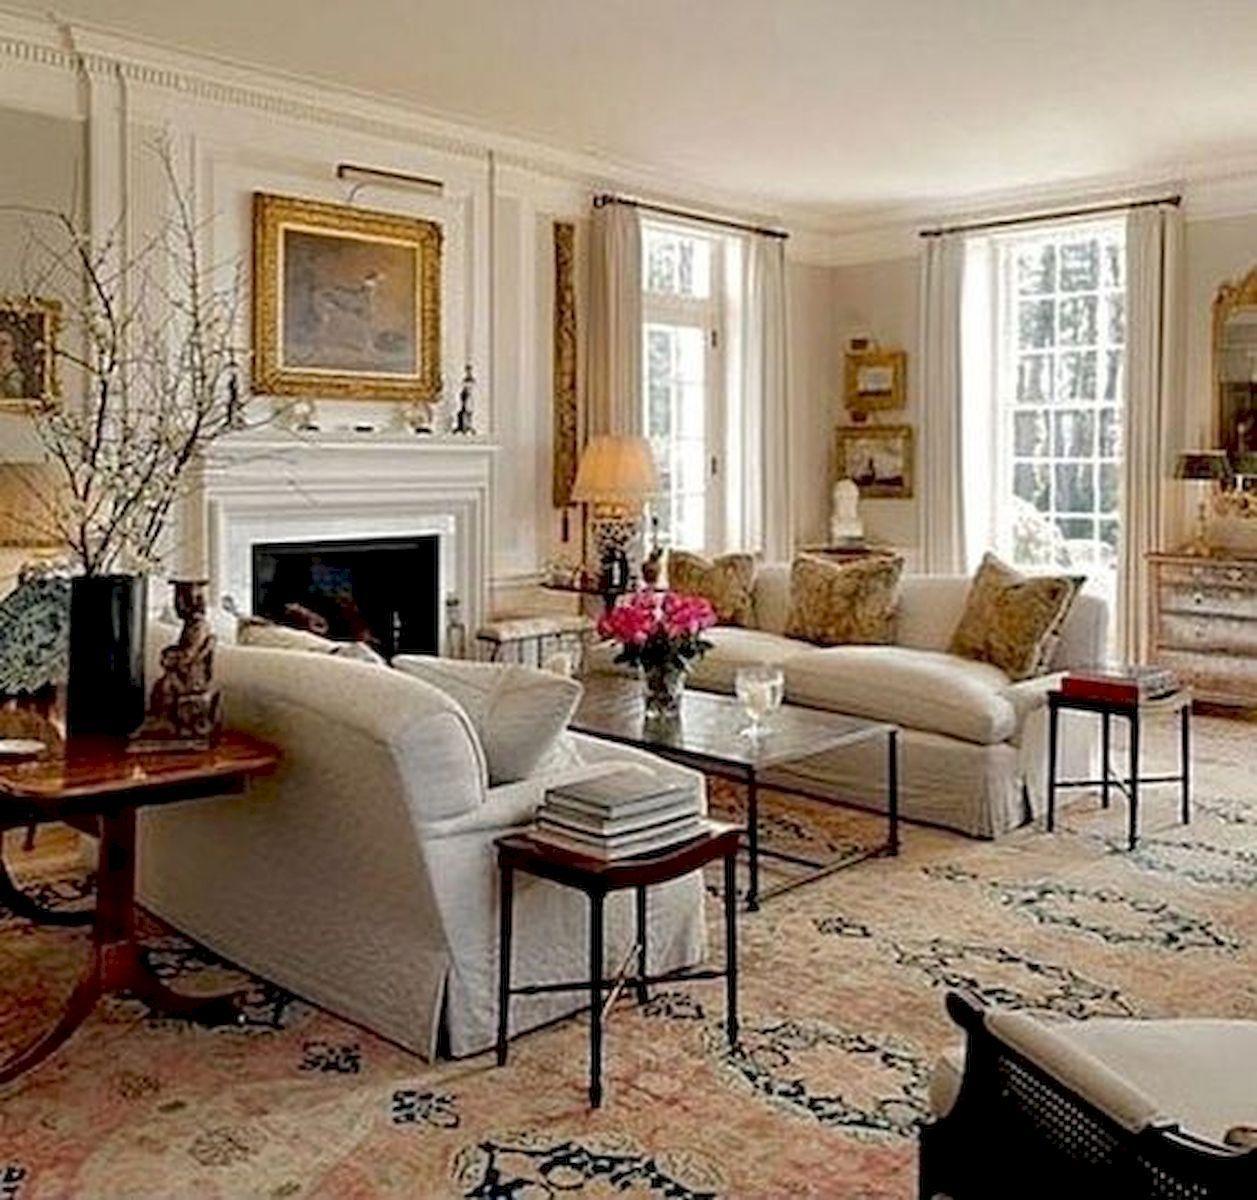 70 Beautiful Traditional Living Room Decor Ideas And Remodel In Formal Living Room Decor Living Room Decor Traditional Living Room Decor Country